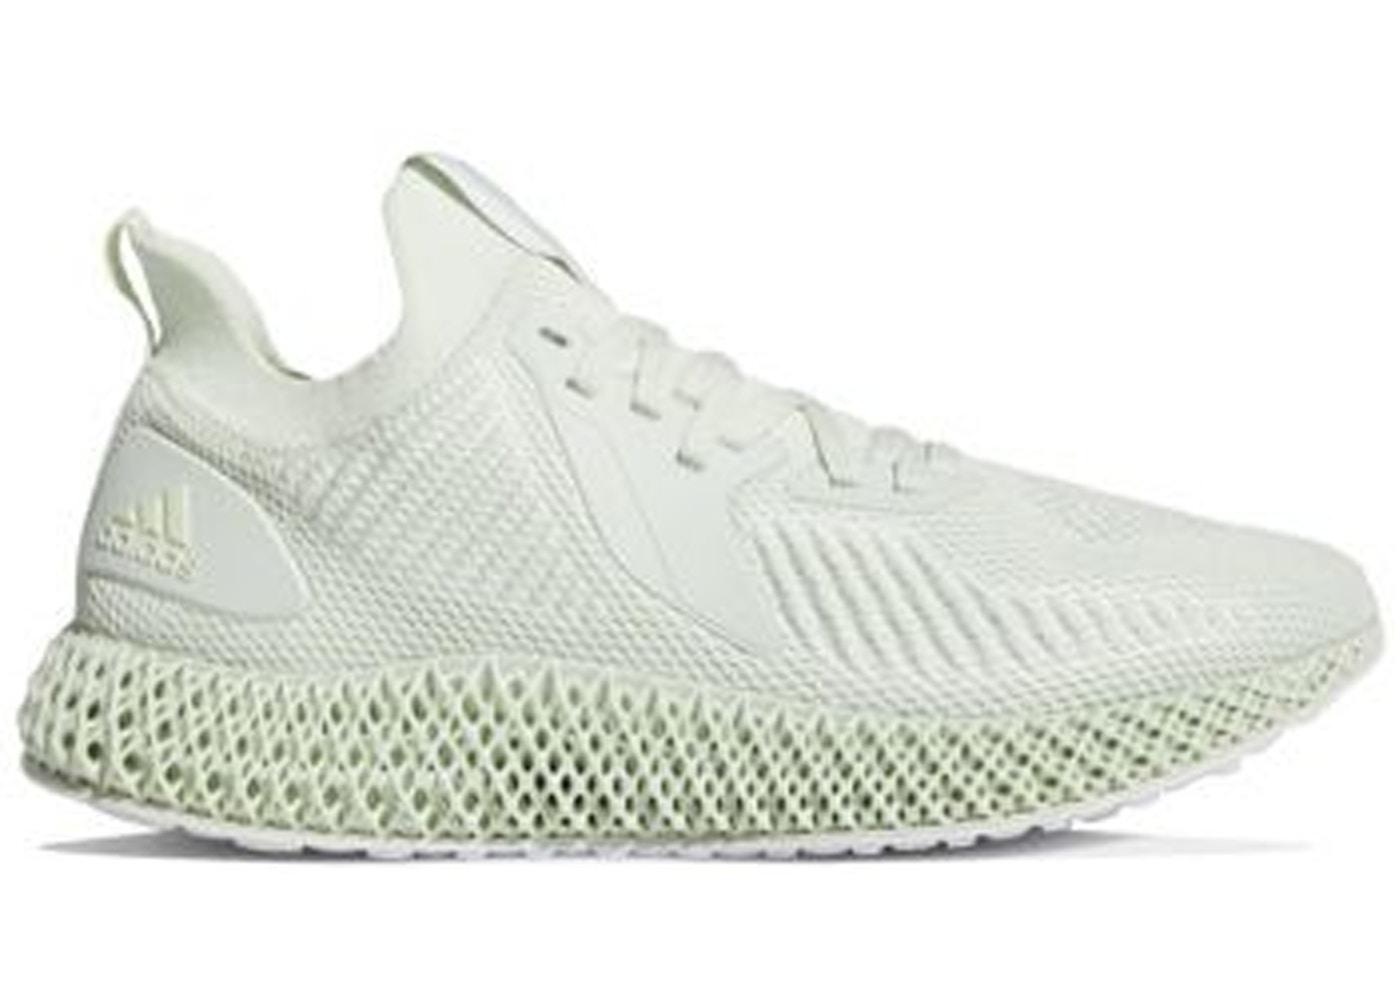 adidas Alphaedge 4D Parley White Aero Green